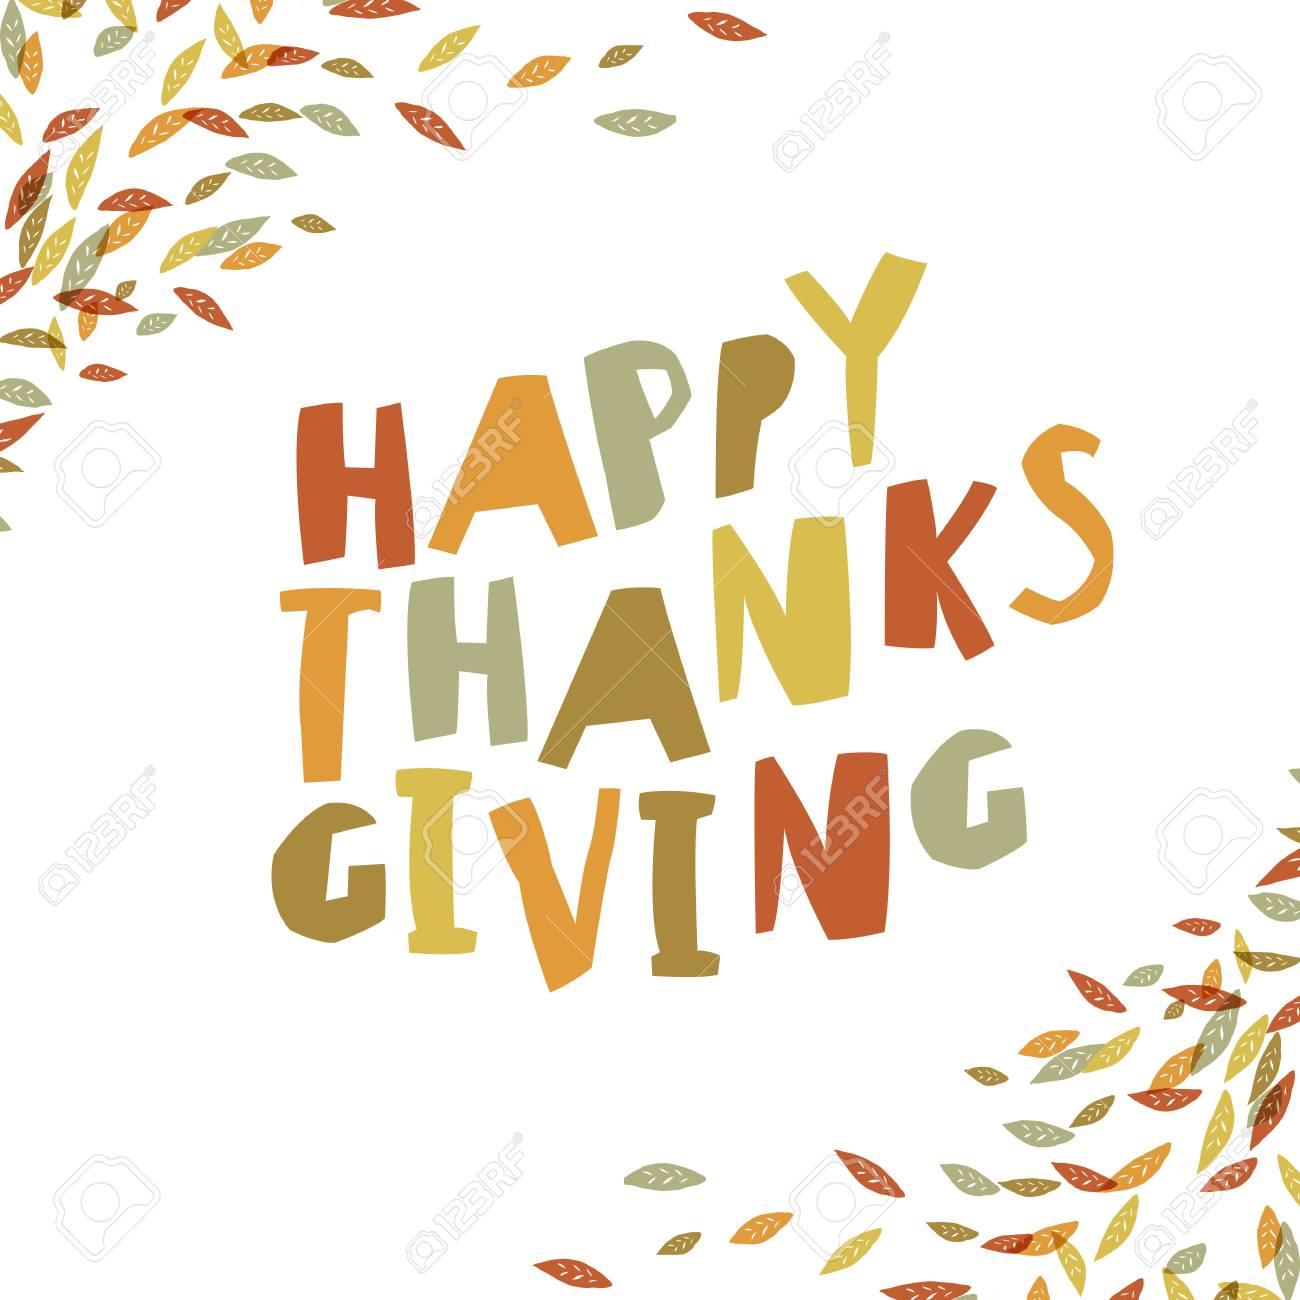 Happy thanksgiving card design paper cut letters and fallen happy thanksgiving card design paper cut letters and fallen leaves for holiday greeting cards m4hsunfo